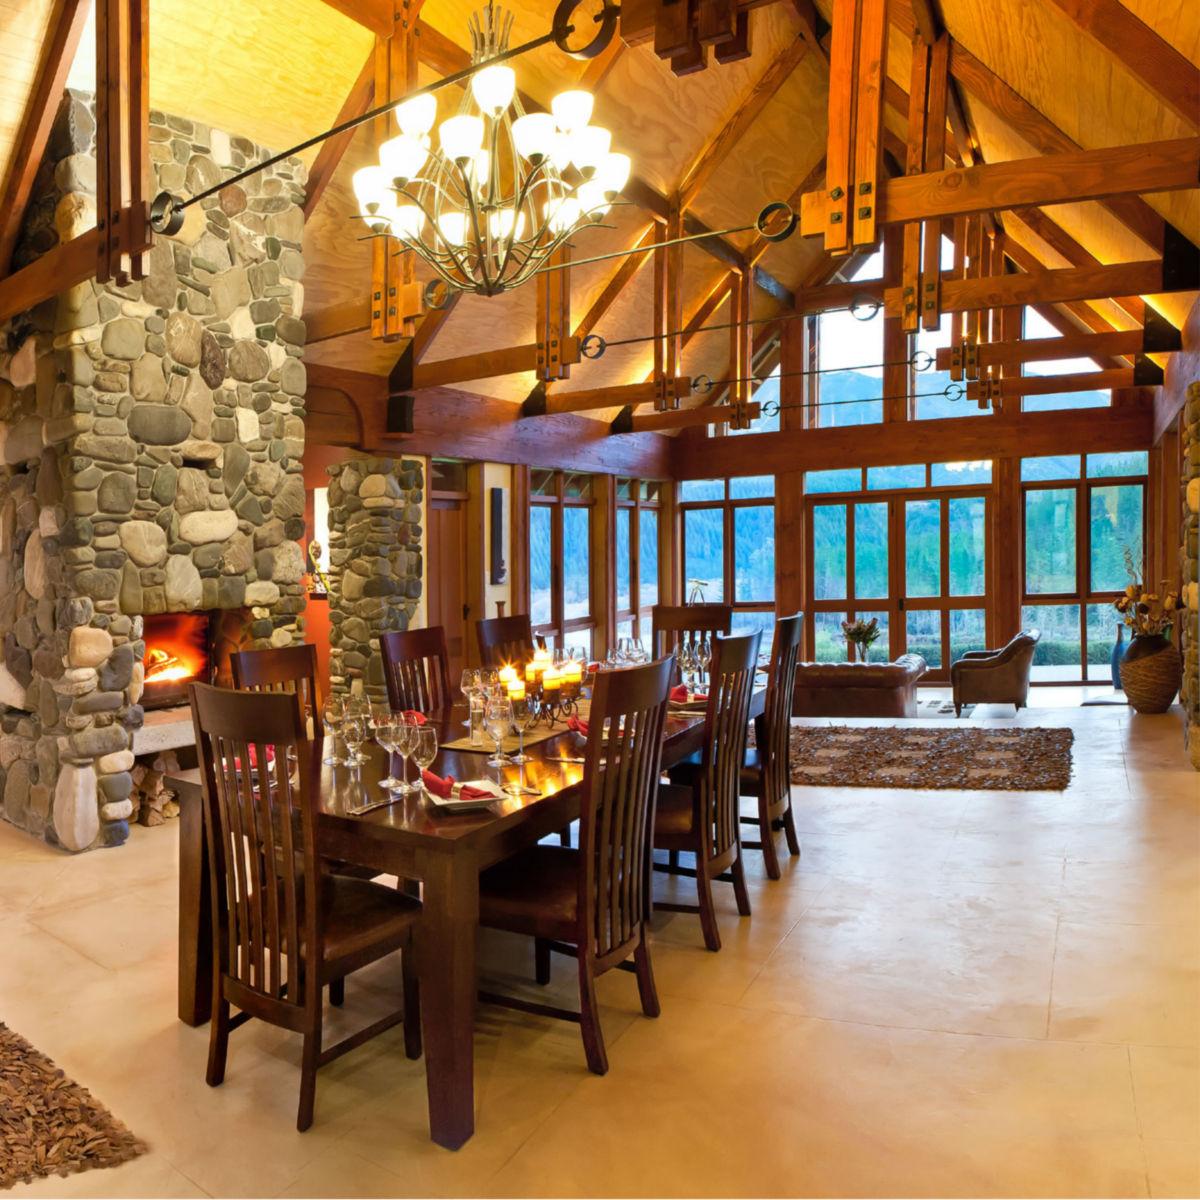 Stonefly Lodge, South Island - image number 0